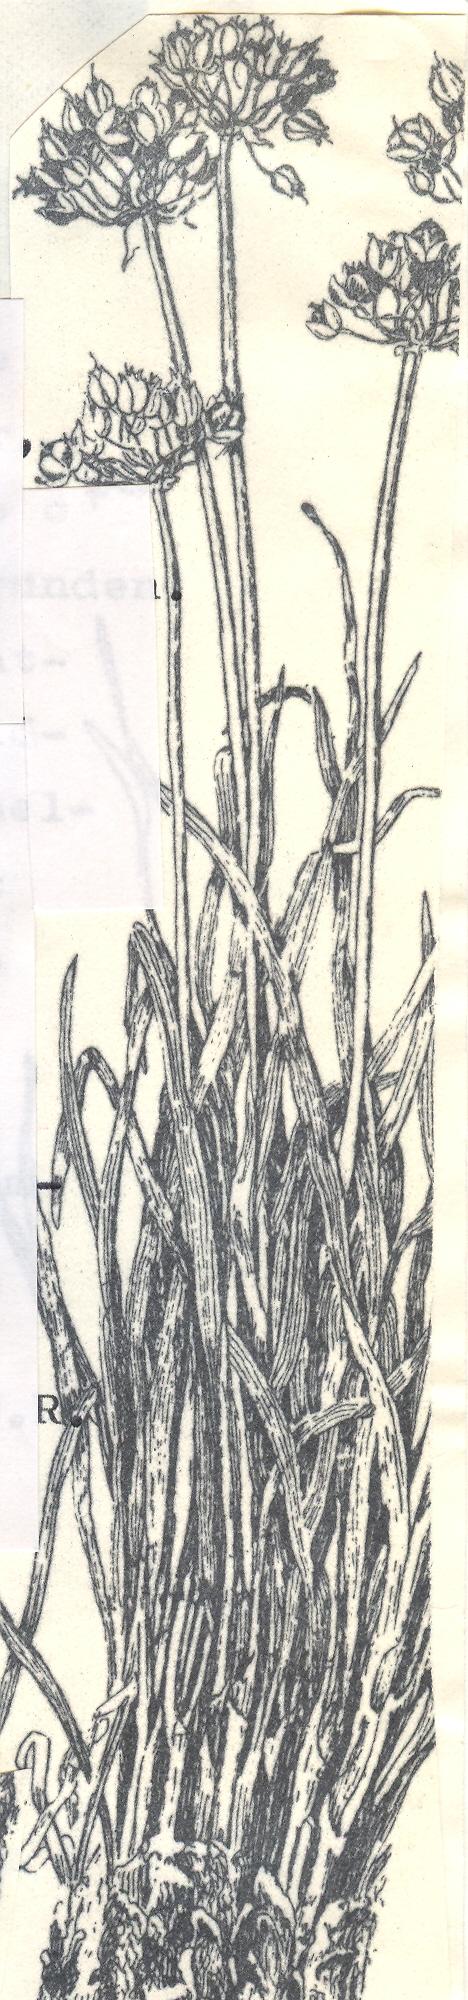 Allium%20oreoprasoides.jpg